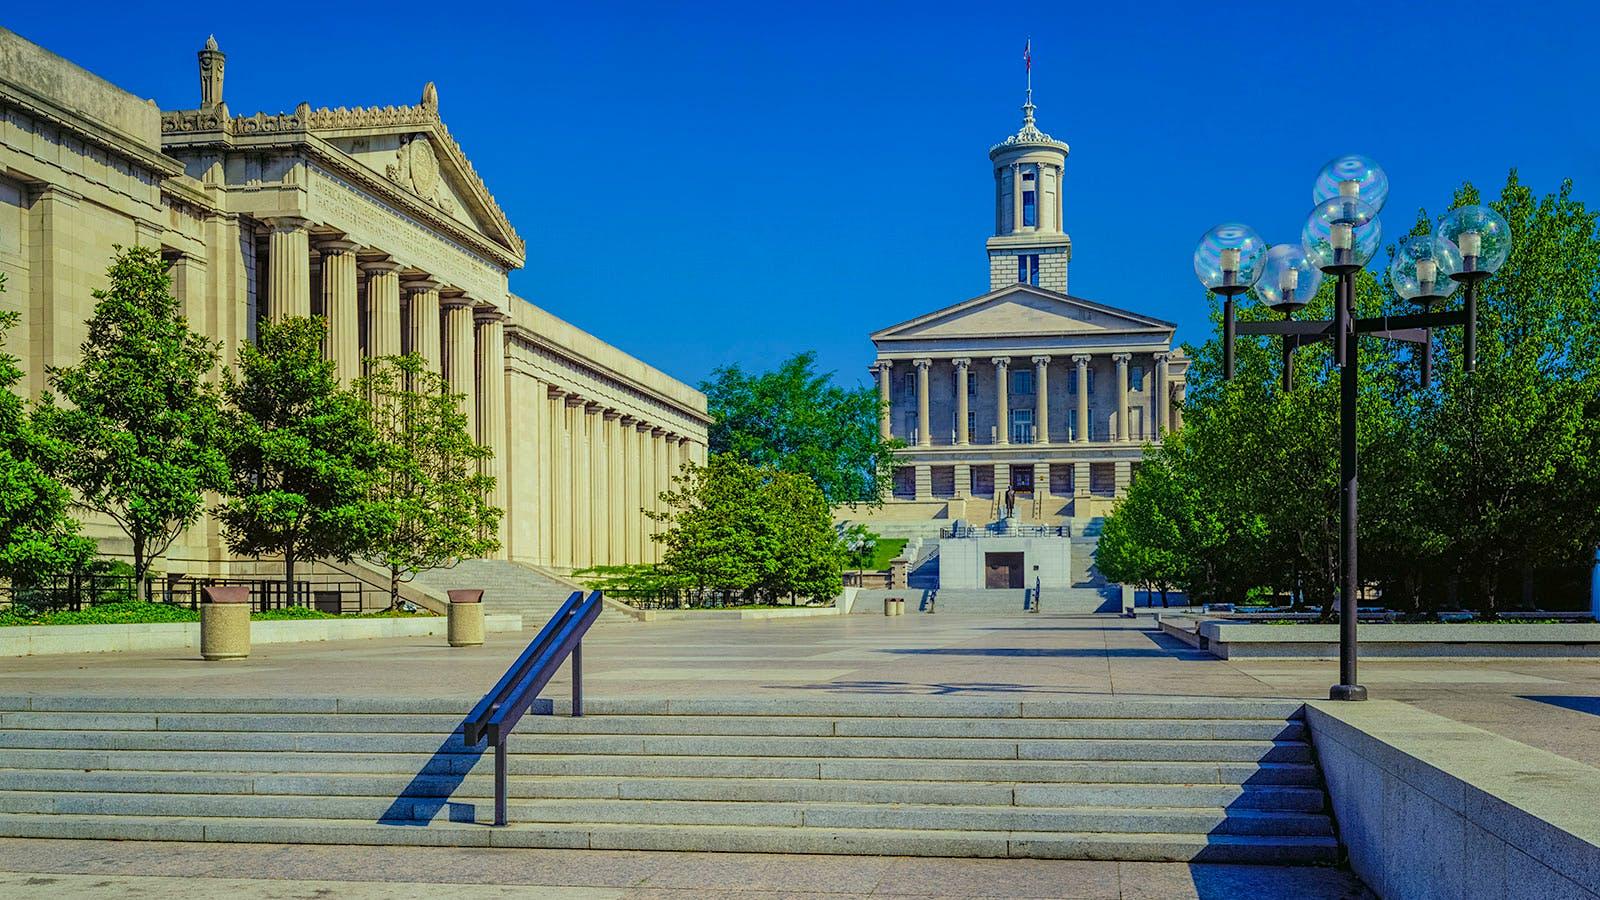 Tennessee Legislators Aim to Limit Winery Direct Shipping Sales